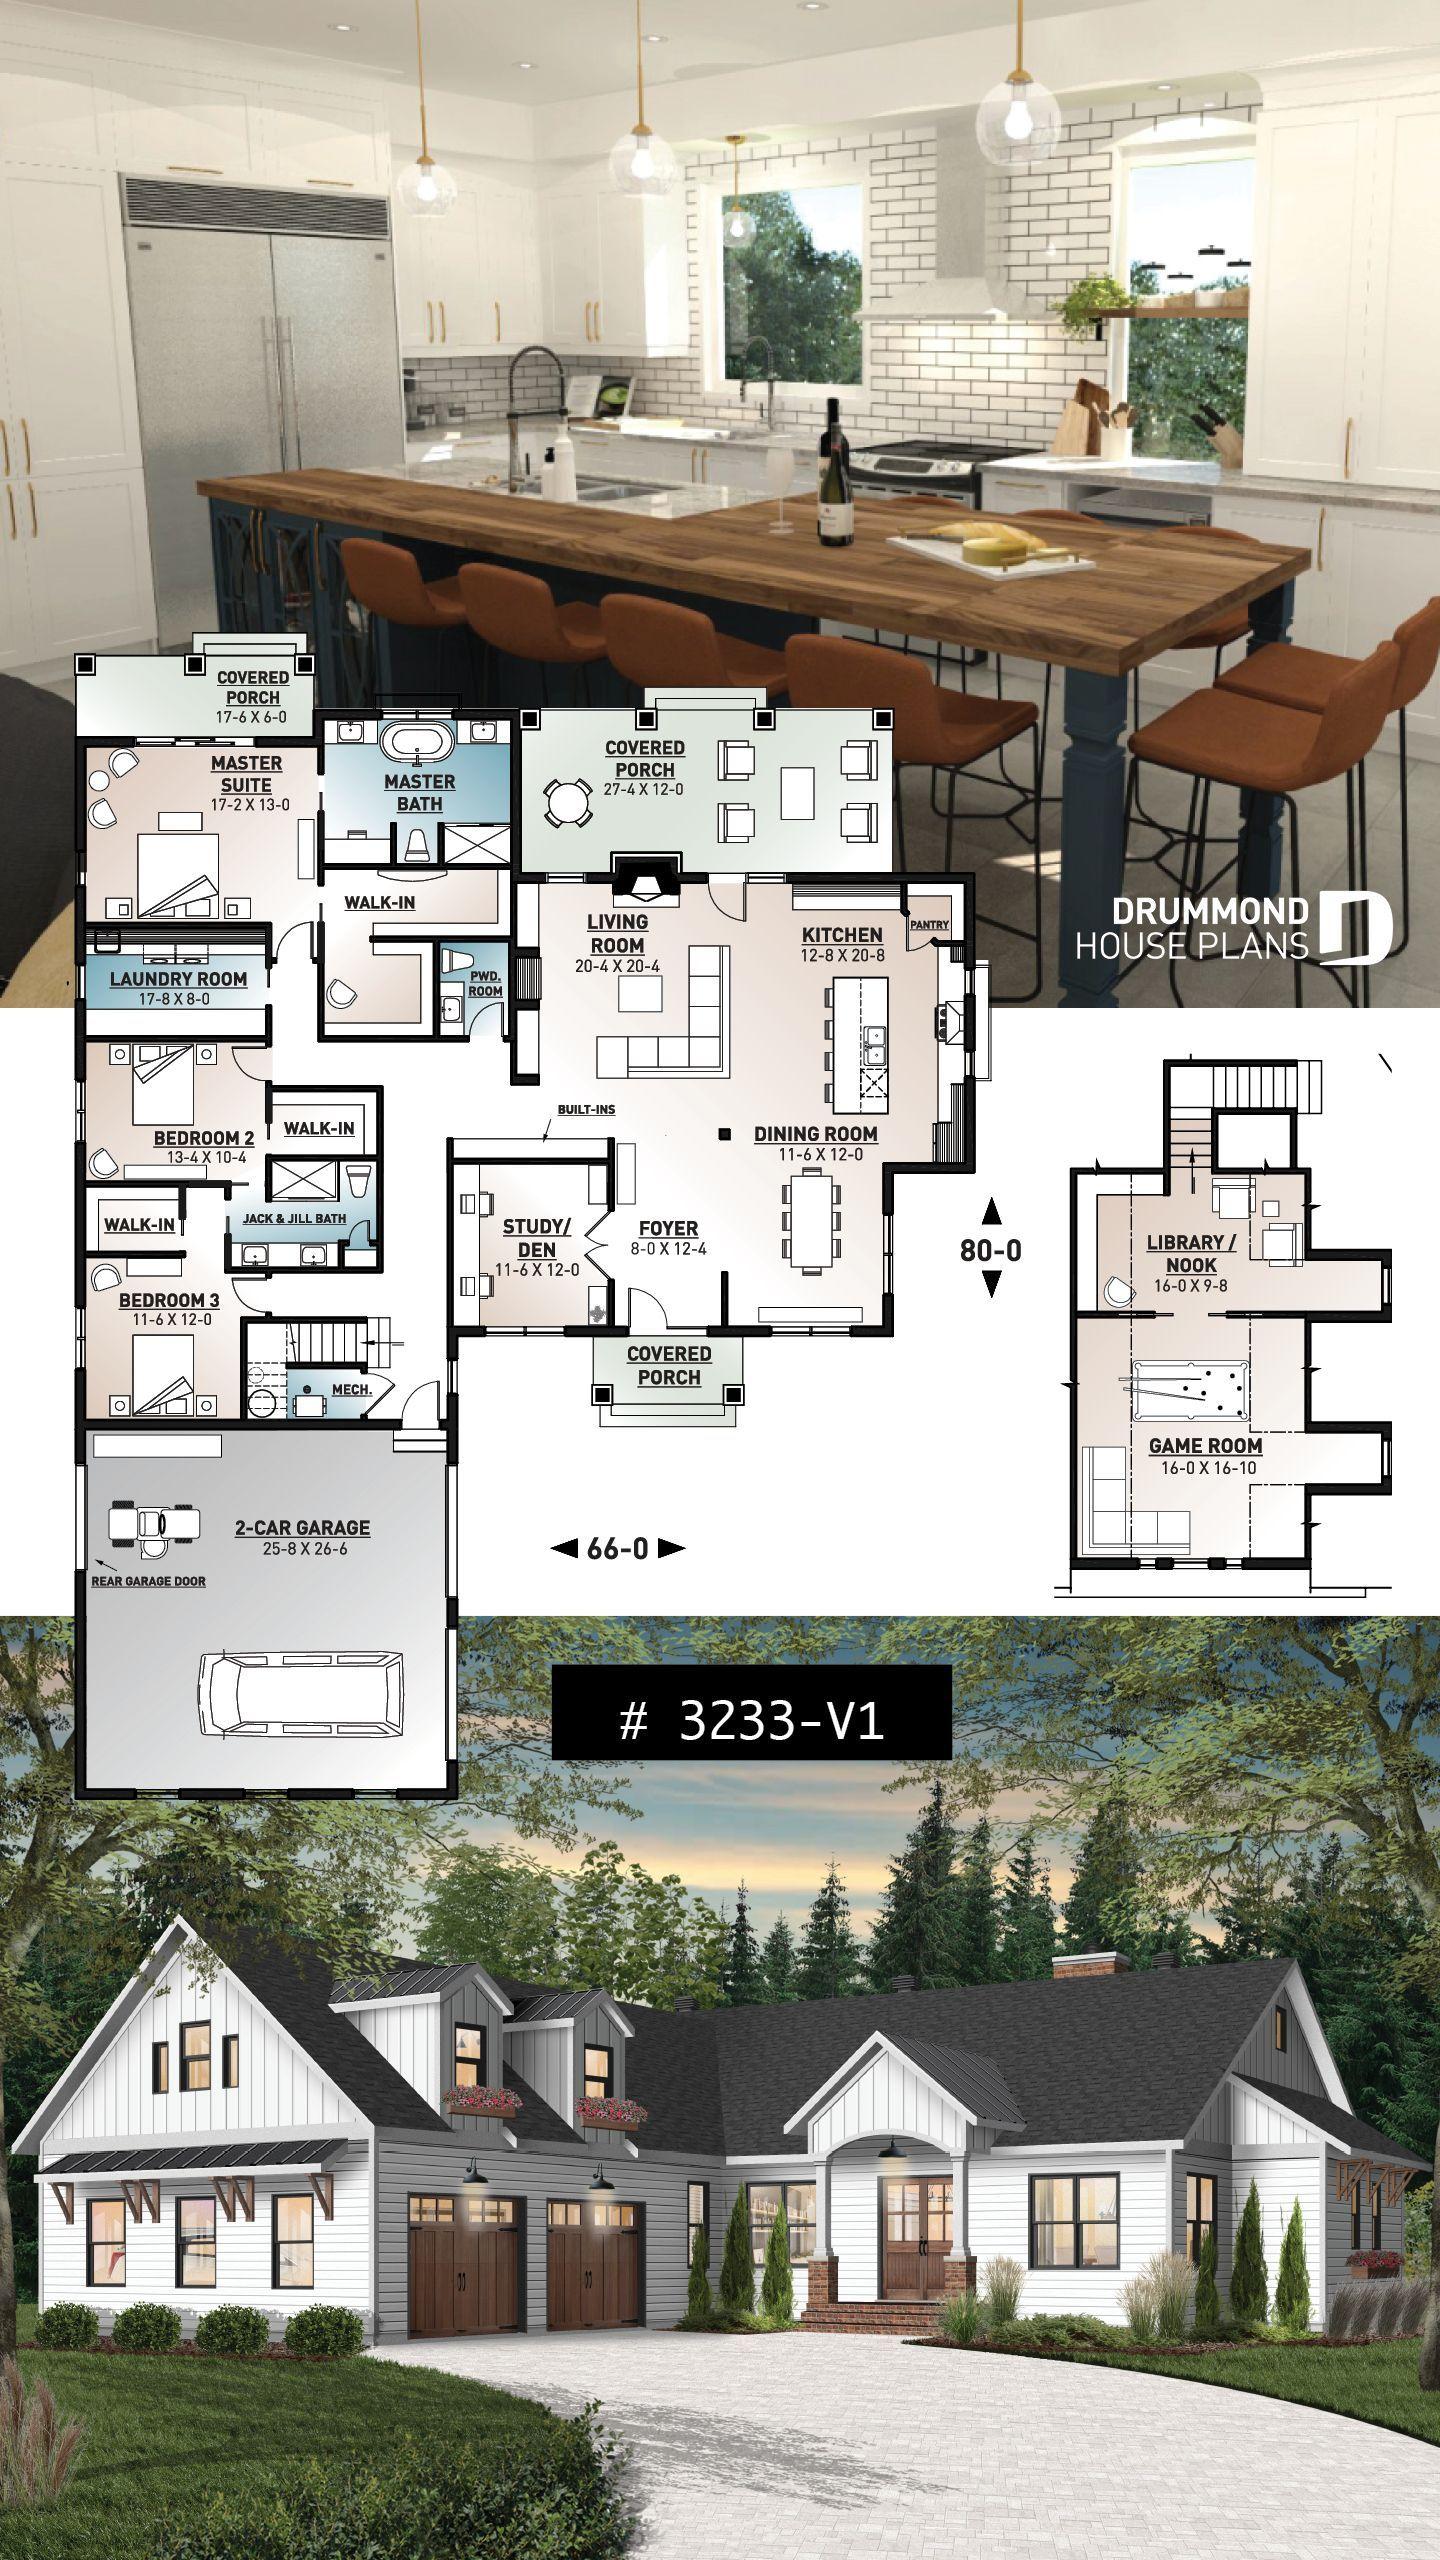 Modern Farmhouse 3 Bedroom House Blueprints Sims House Plans House Layout Plans